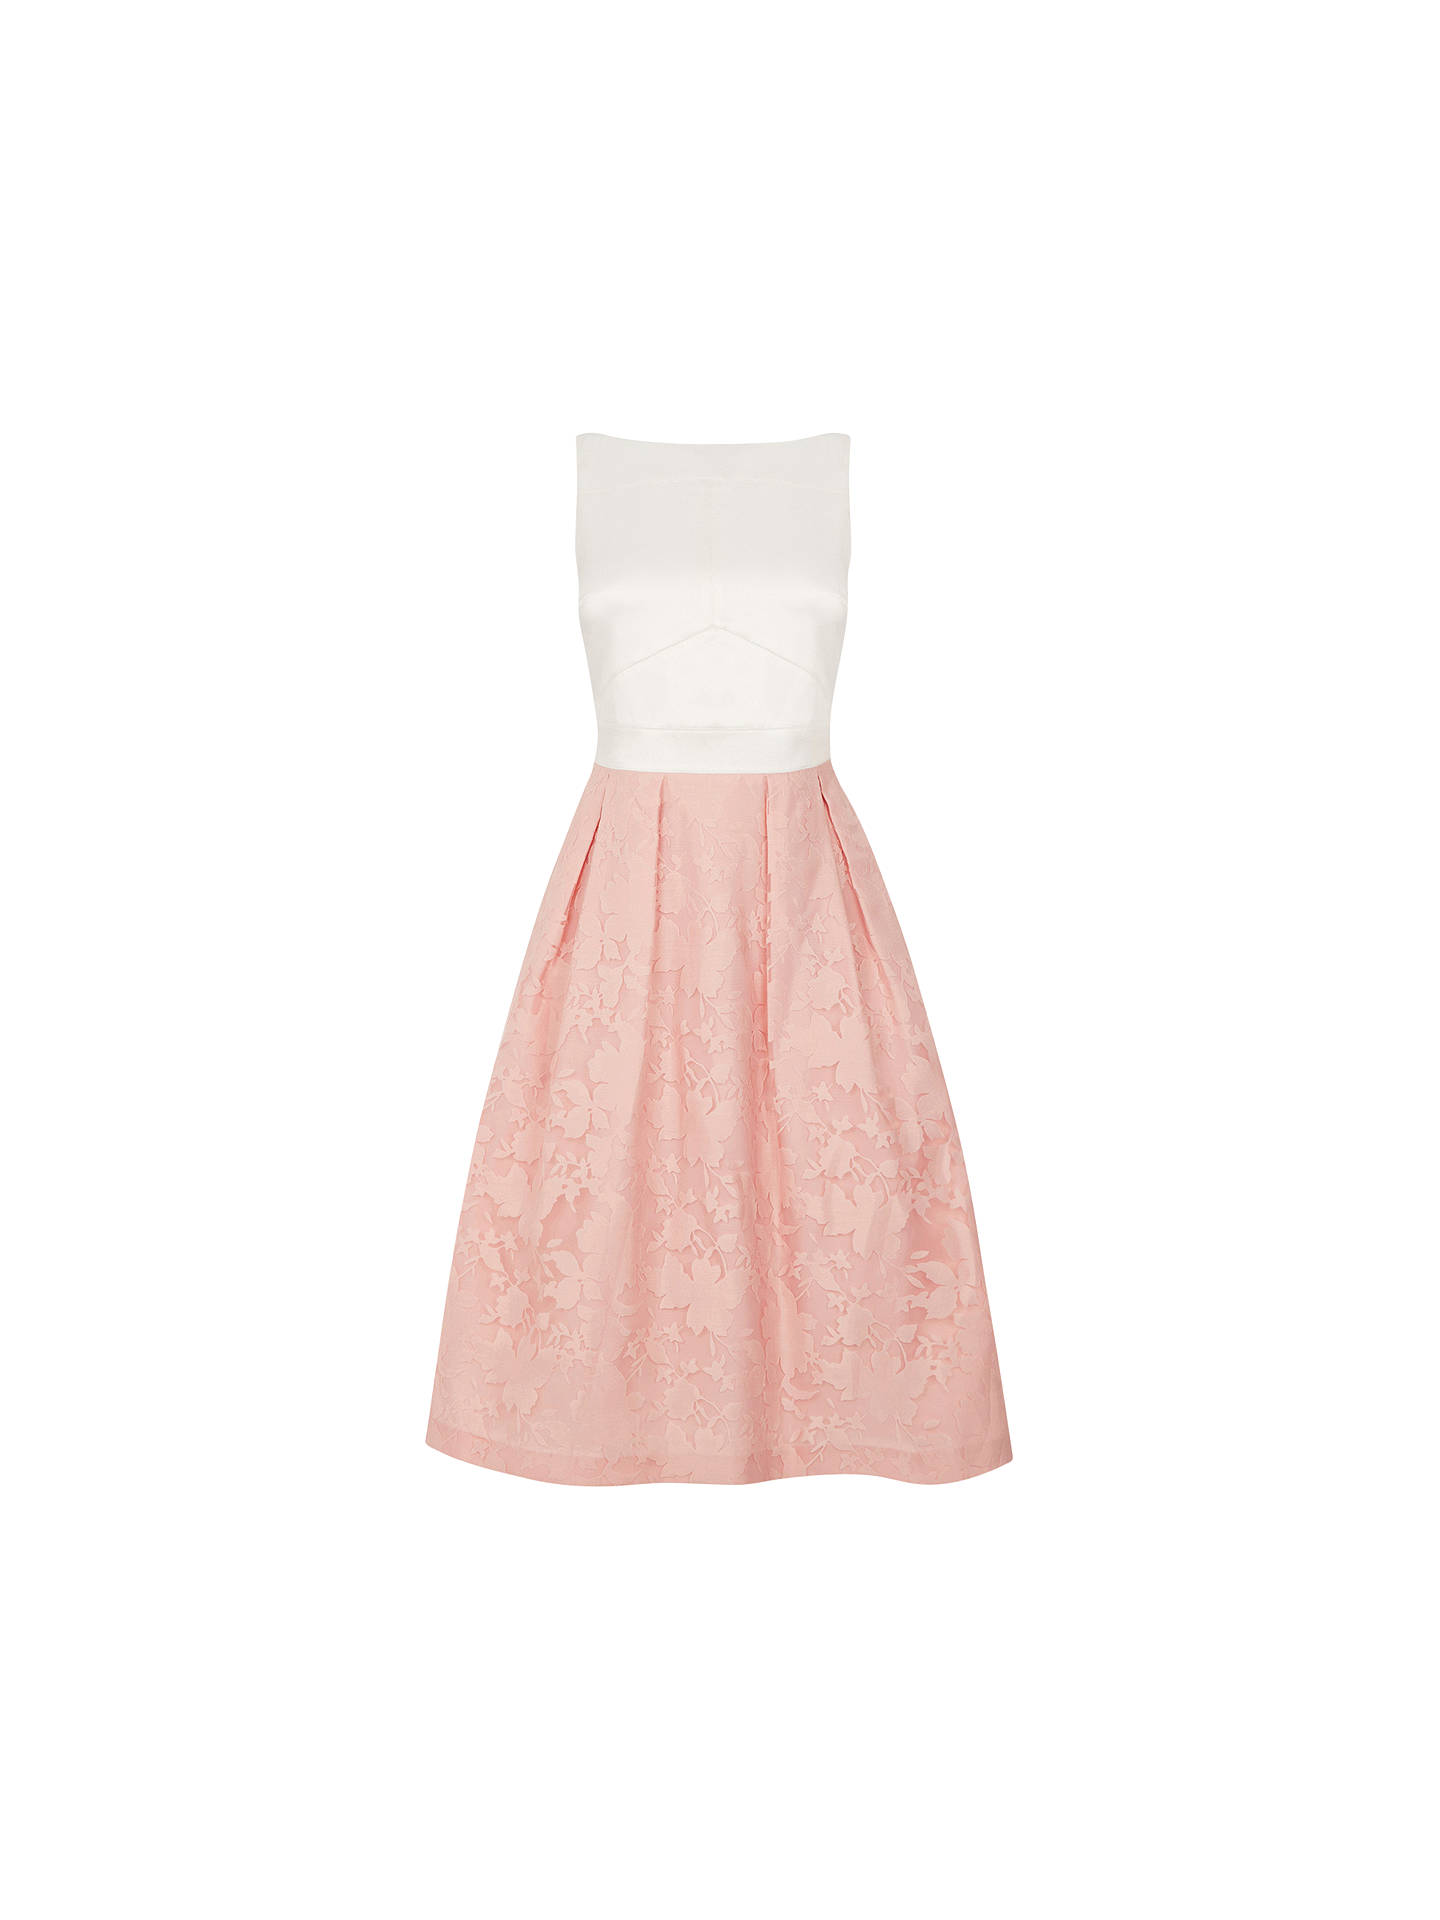 8b1402e82a4 Buy Oasis Organza Midi Dress